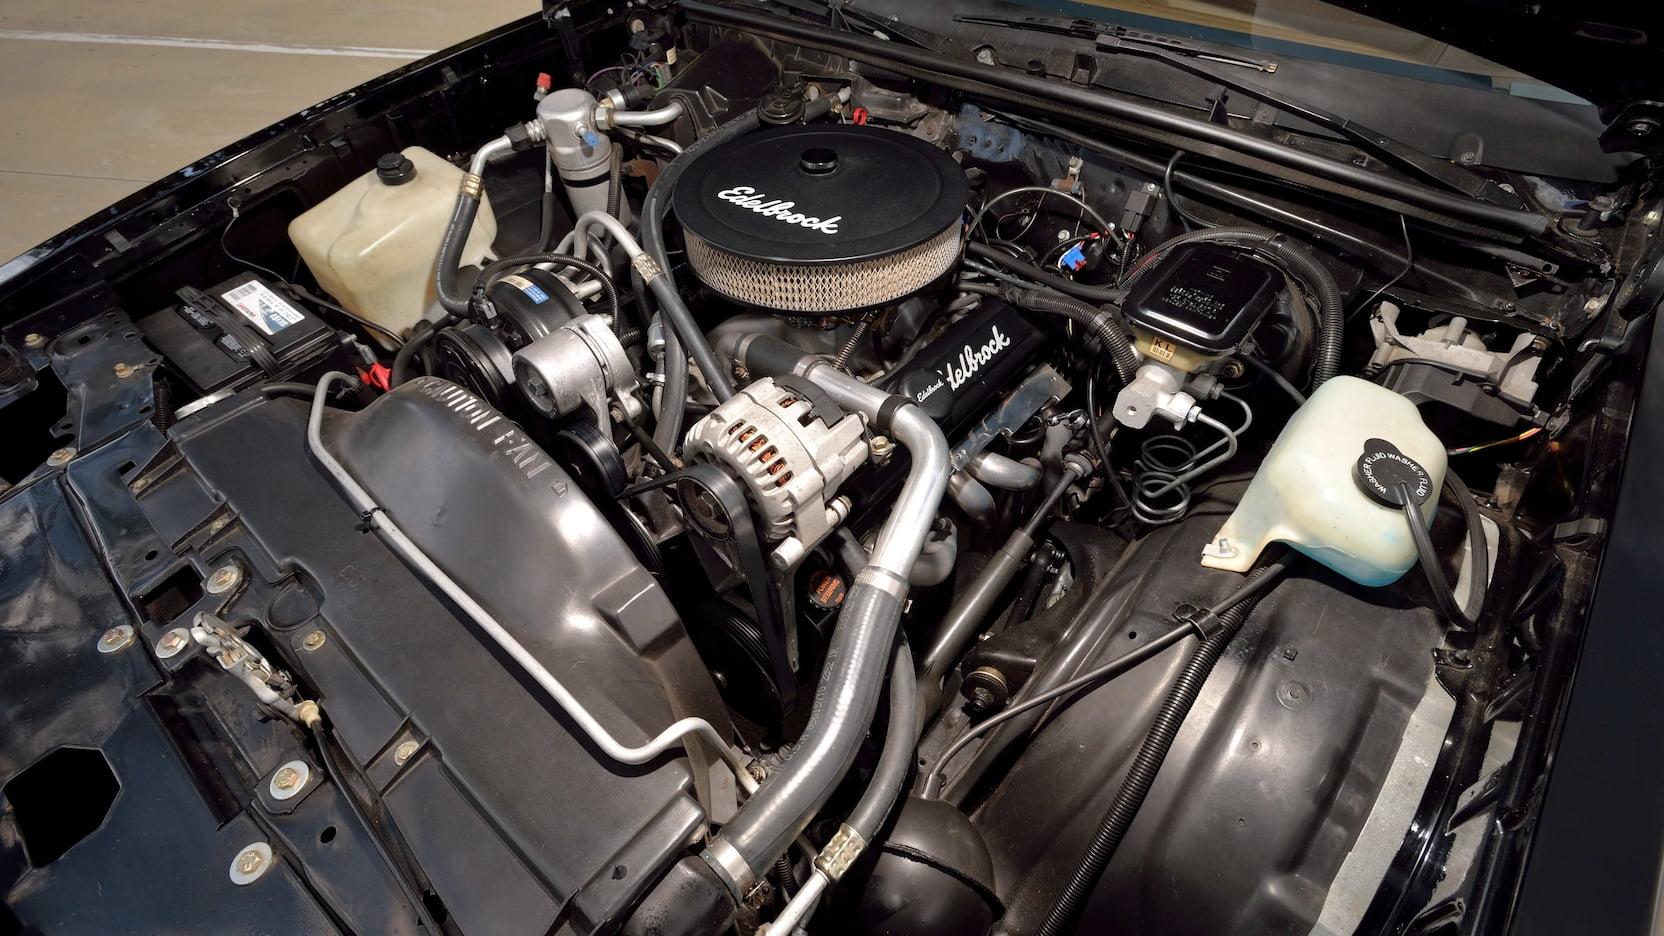 1988 Chevrolet Monte Carlo SS engine